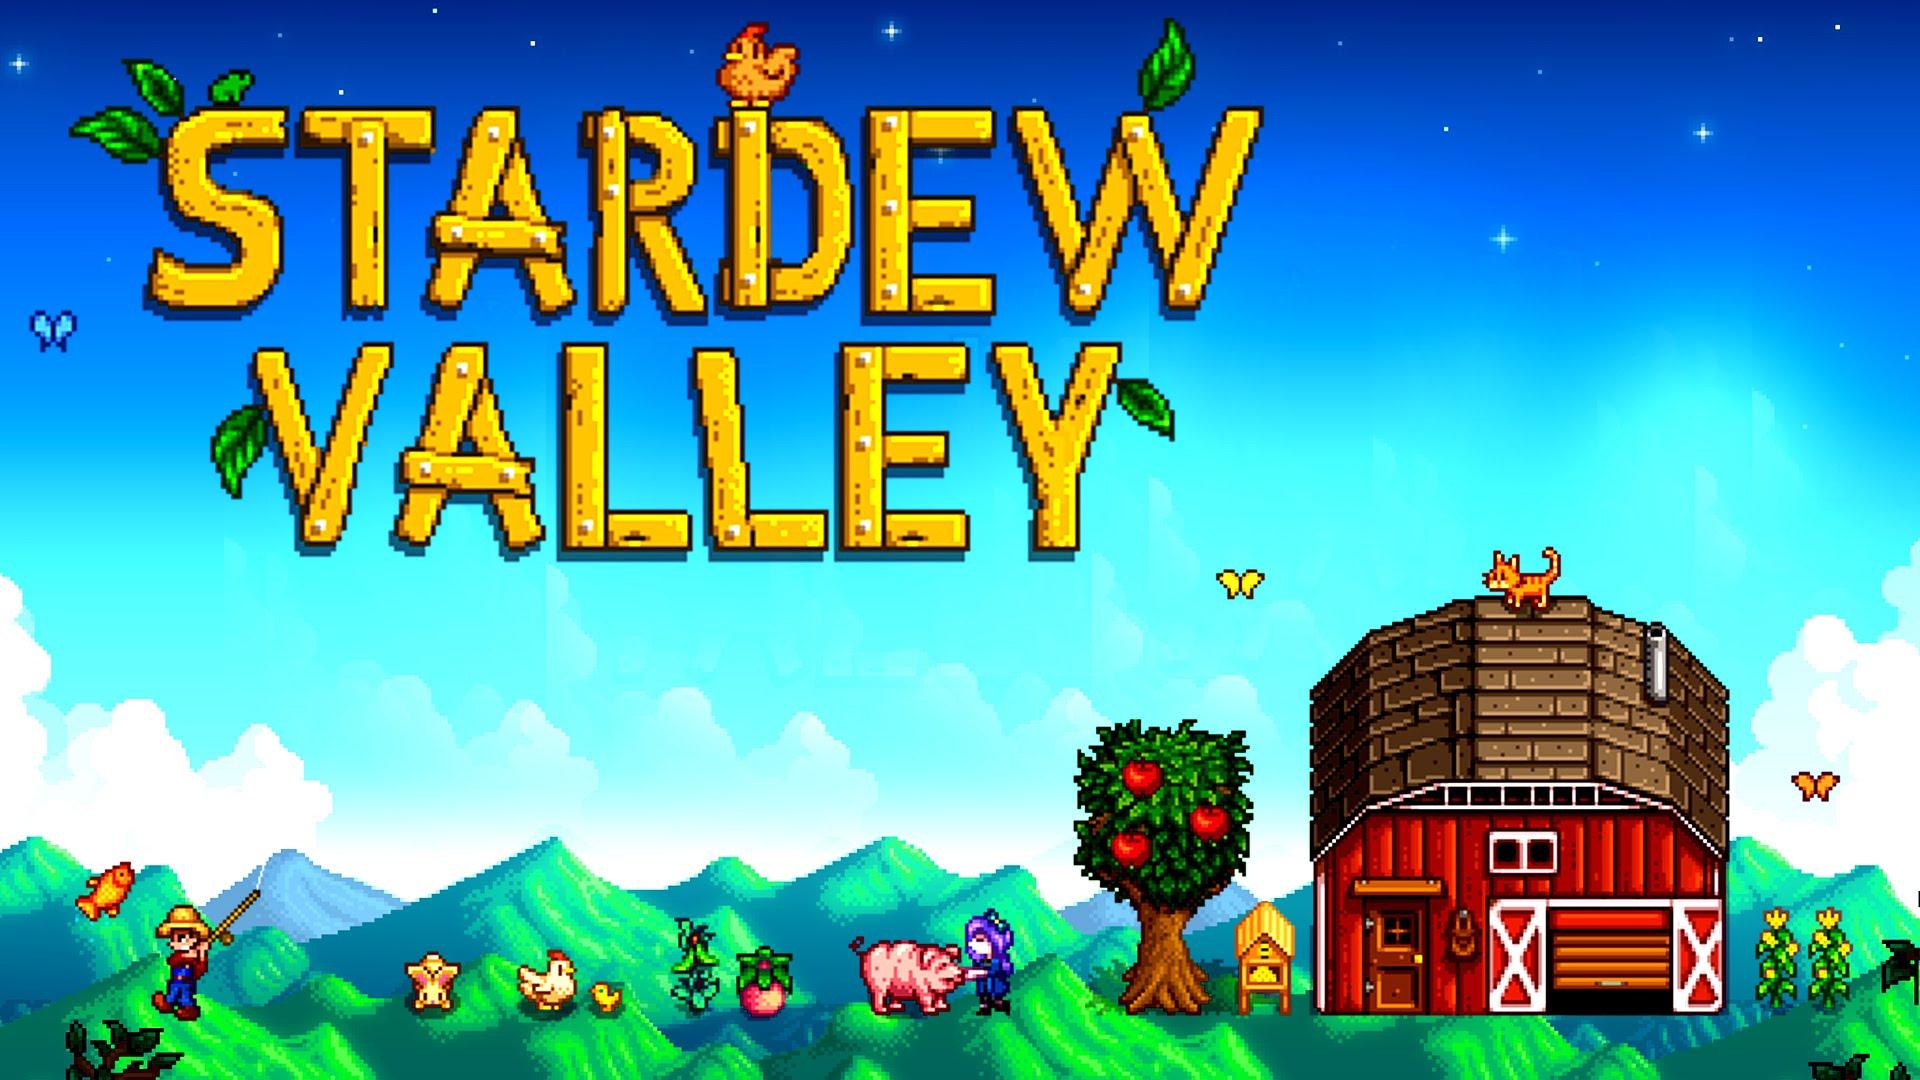 Stardew Valley HD Wallpaper | Background Image | 1920x1080 ...